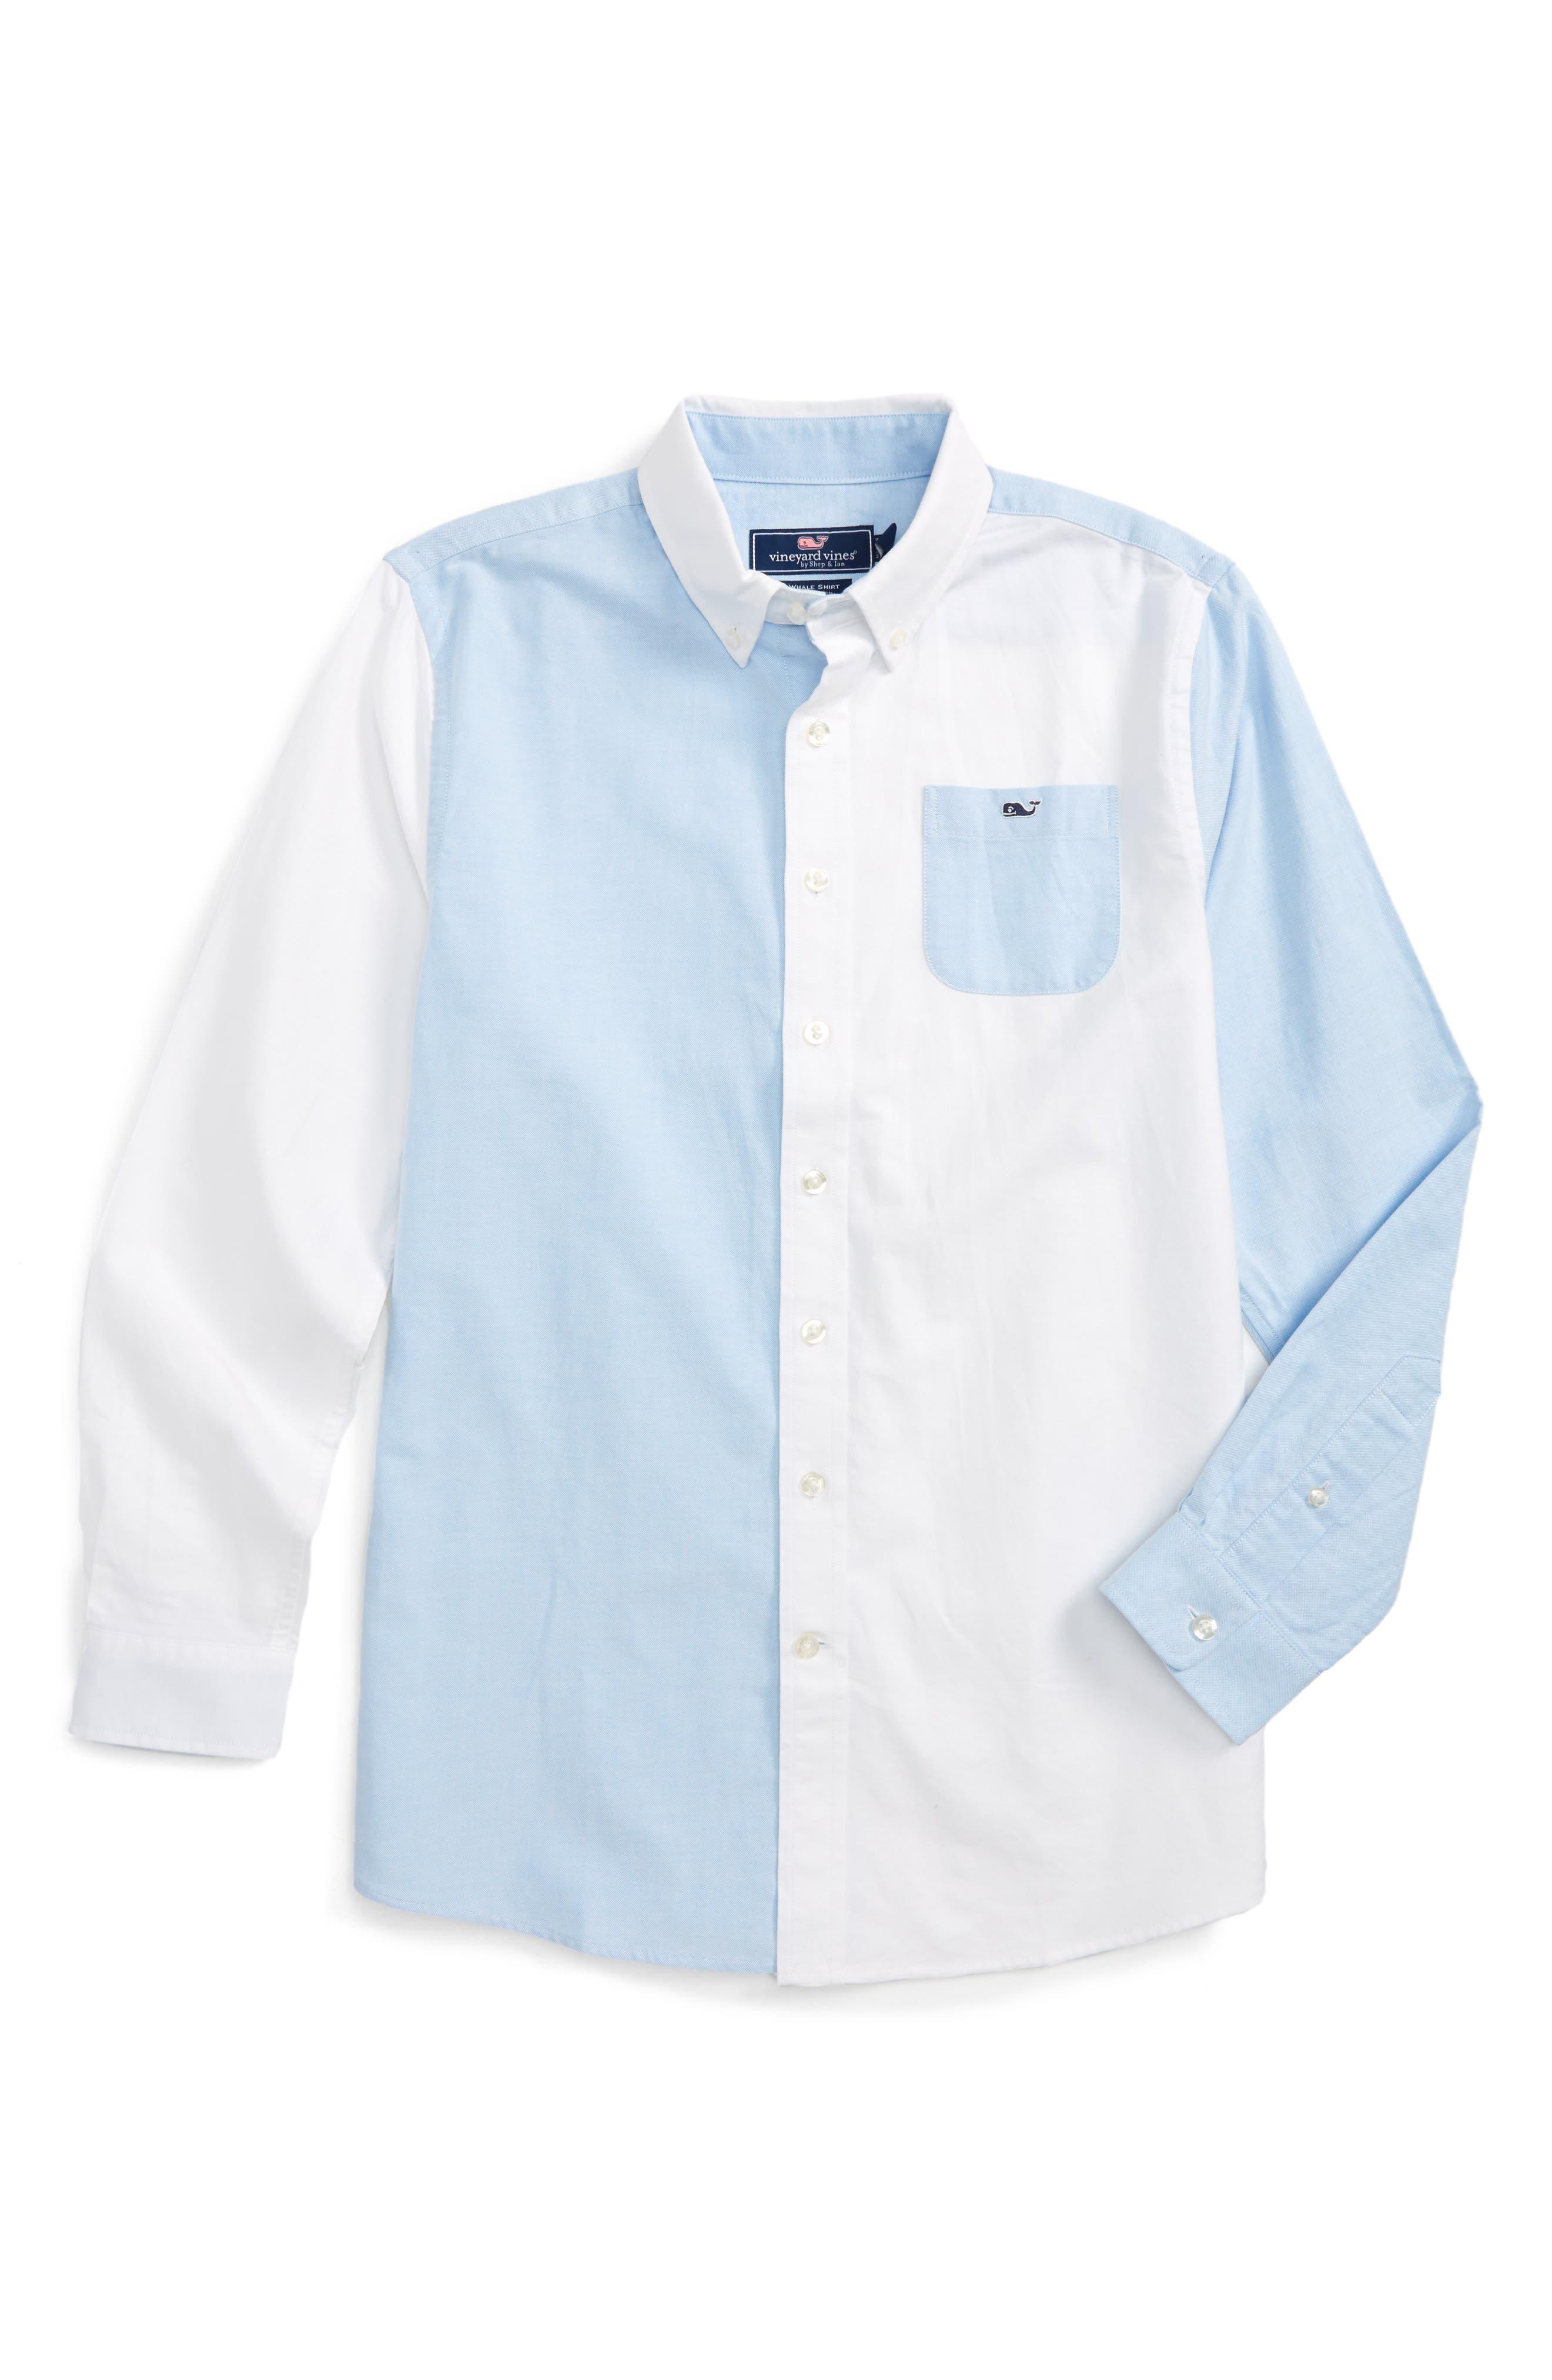 Vineyard Vines Party Whale Oxford Shirt (Big Boys)